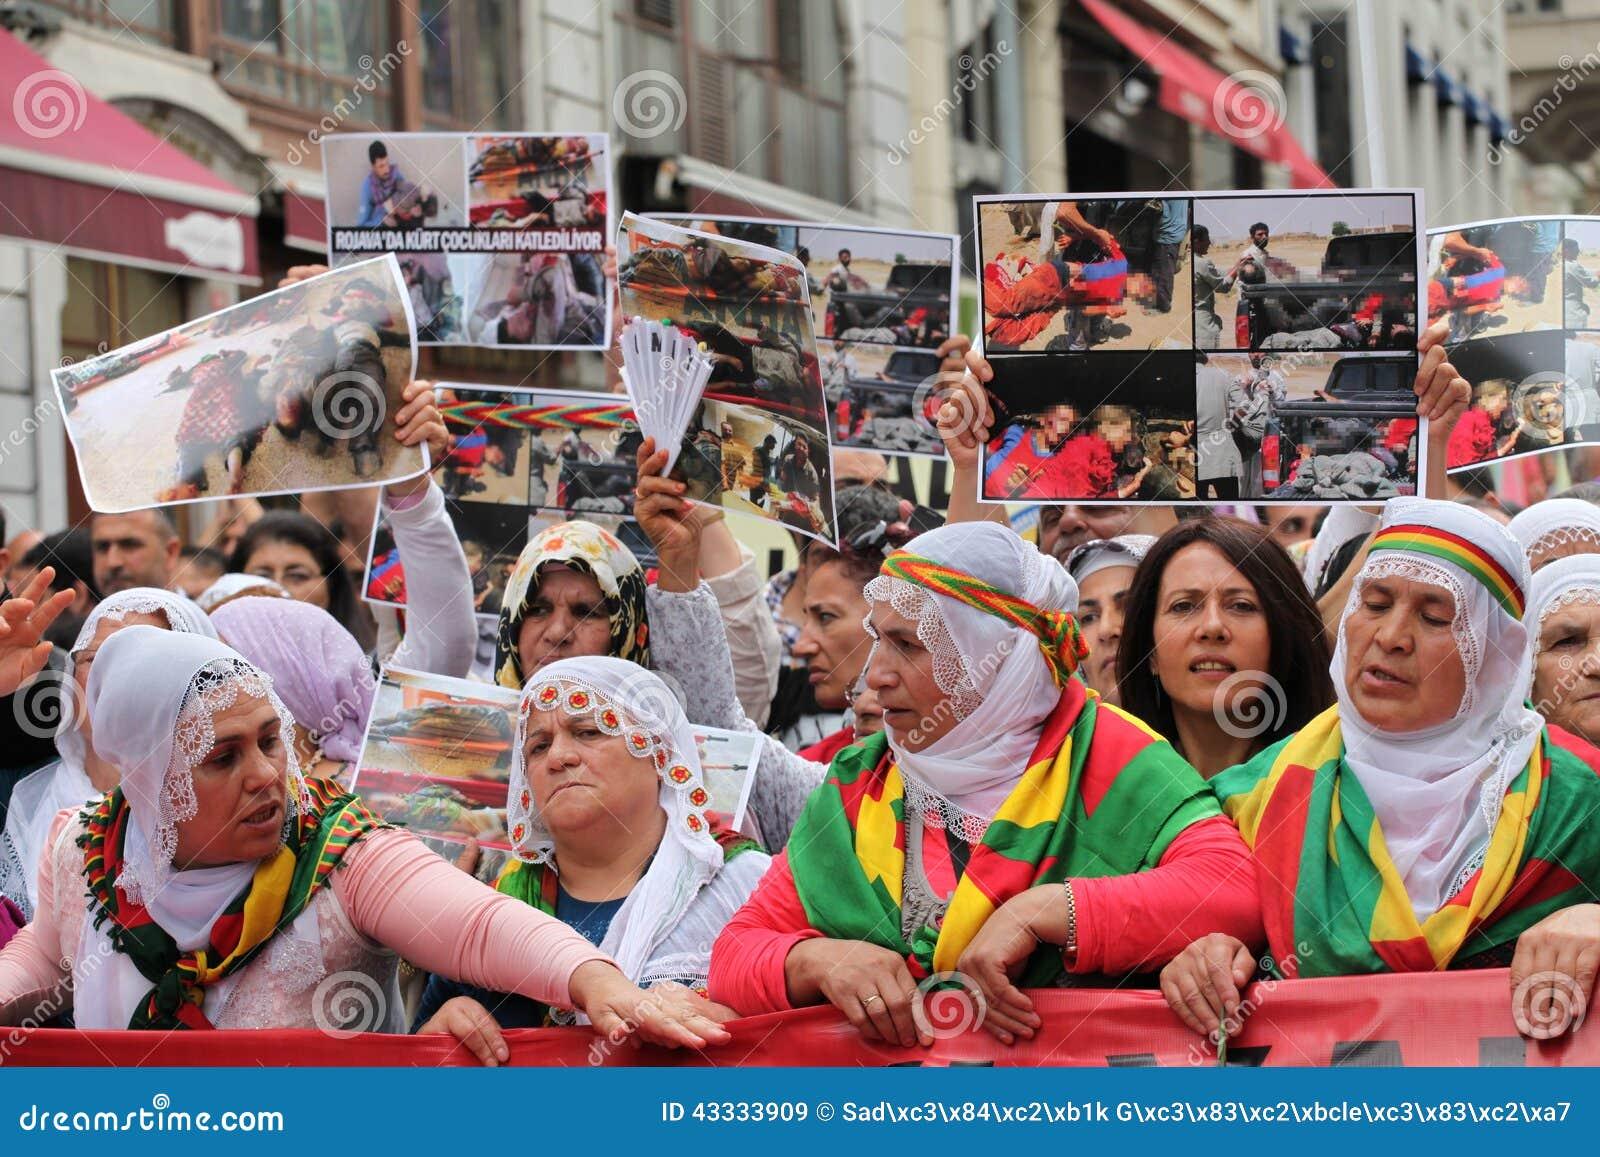 Pilgrims Archives - Common Sense Evaluation   Democratic Turkey